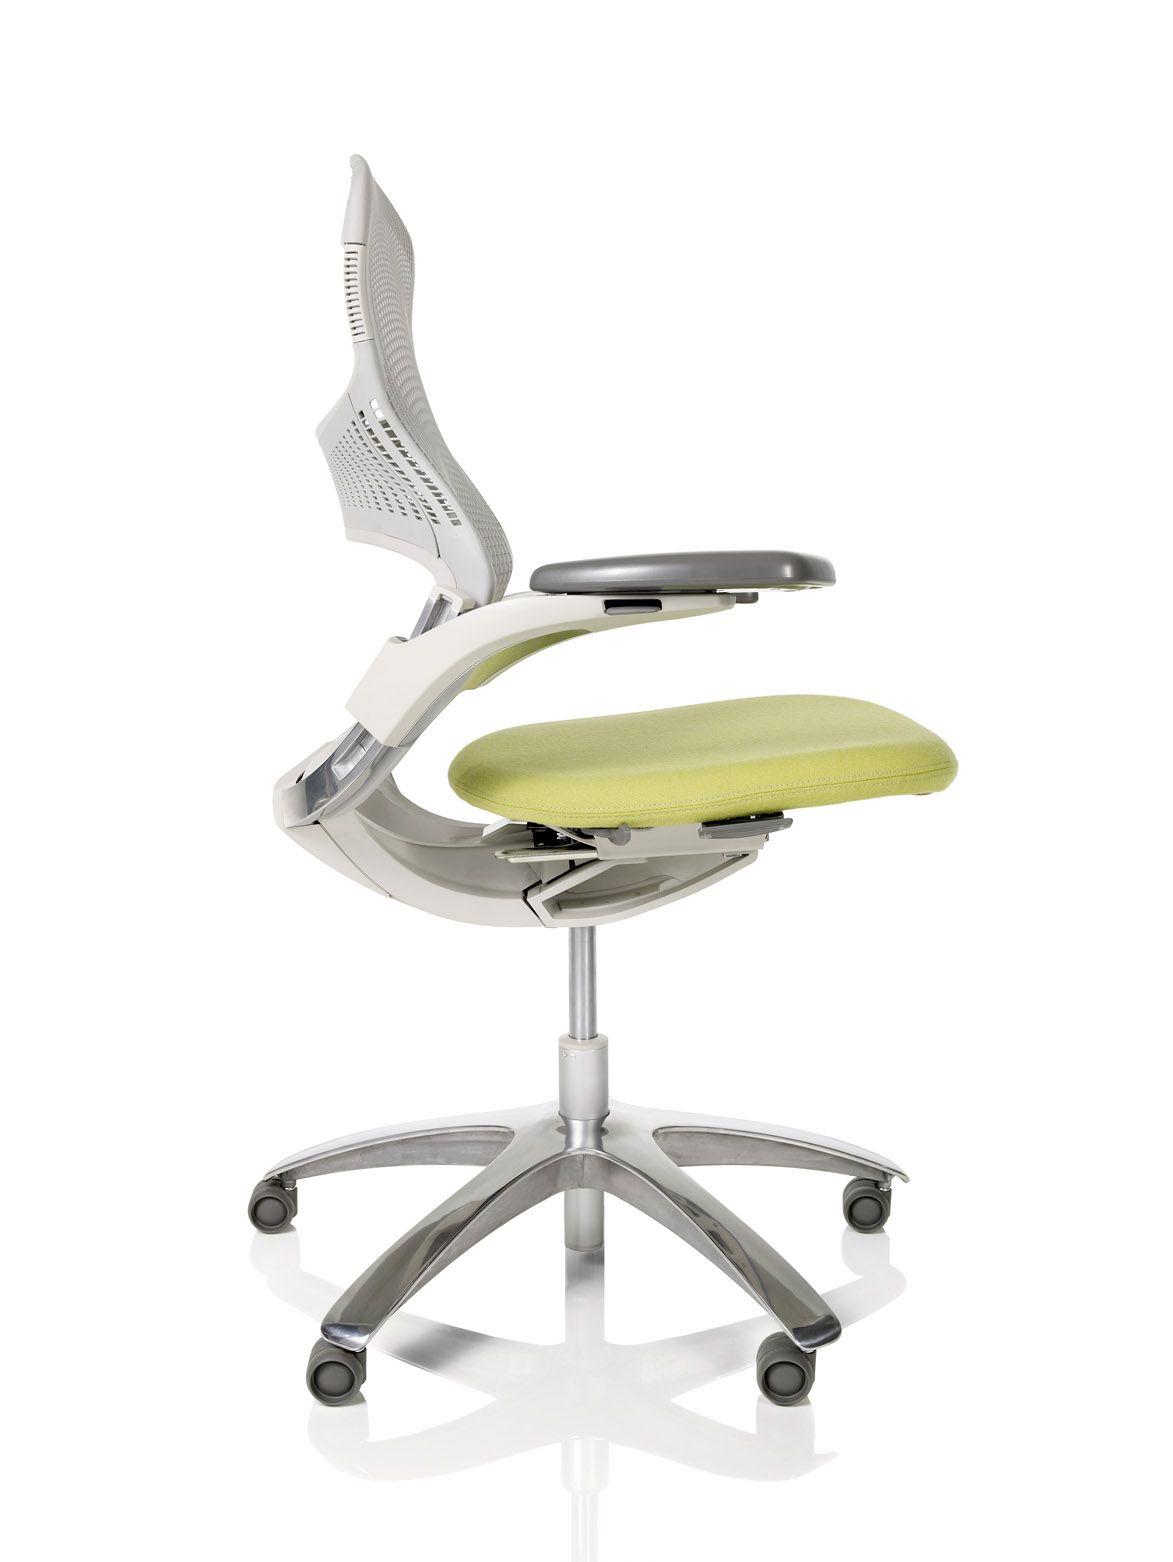 Knoll life chair geek - Knoll Generation Chair